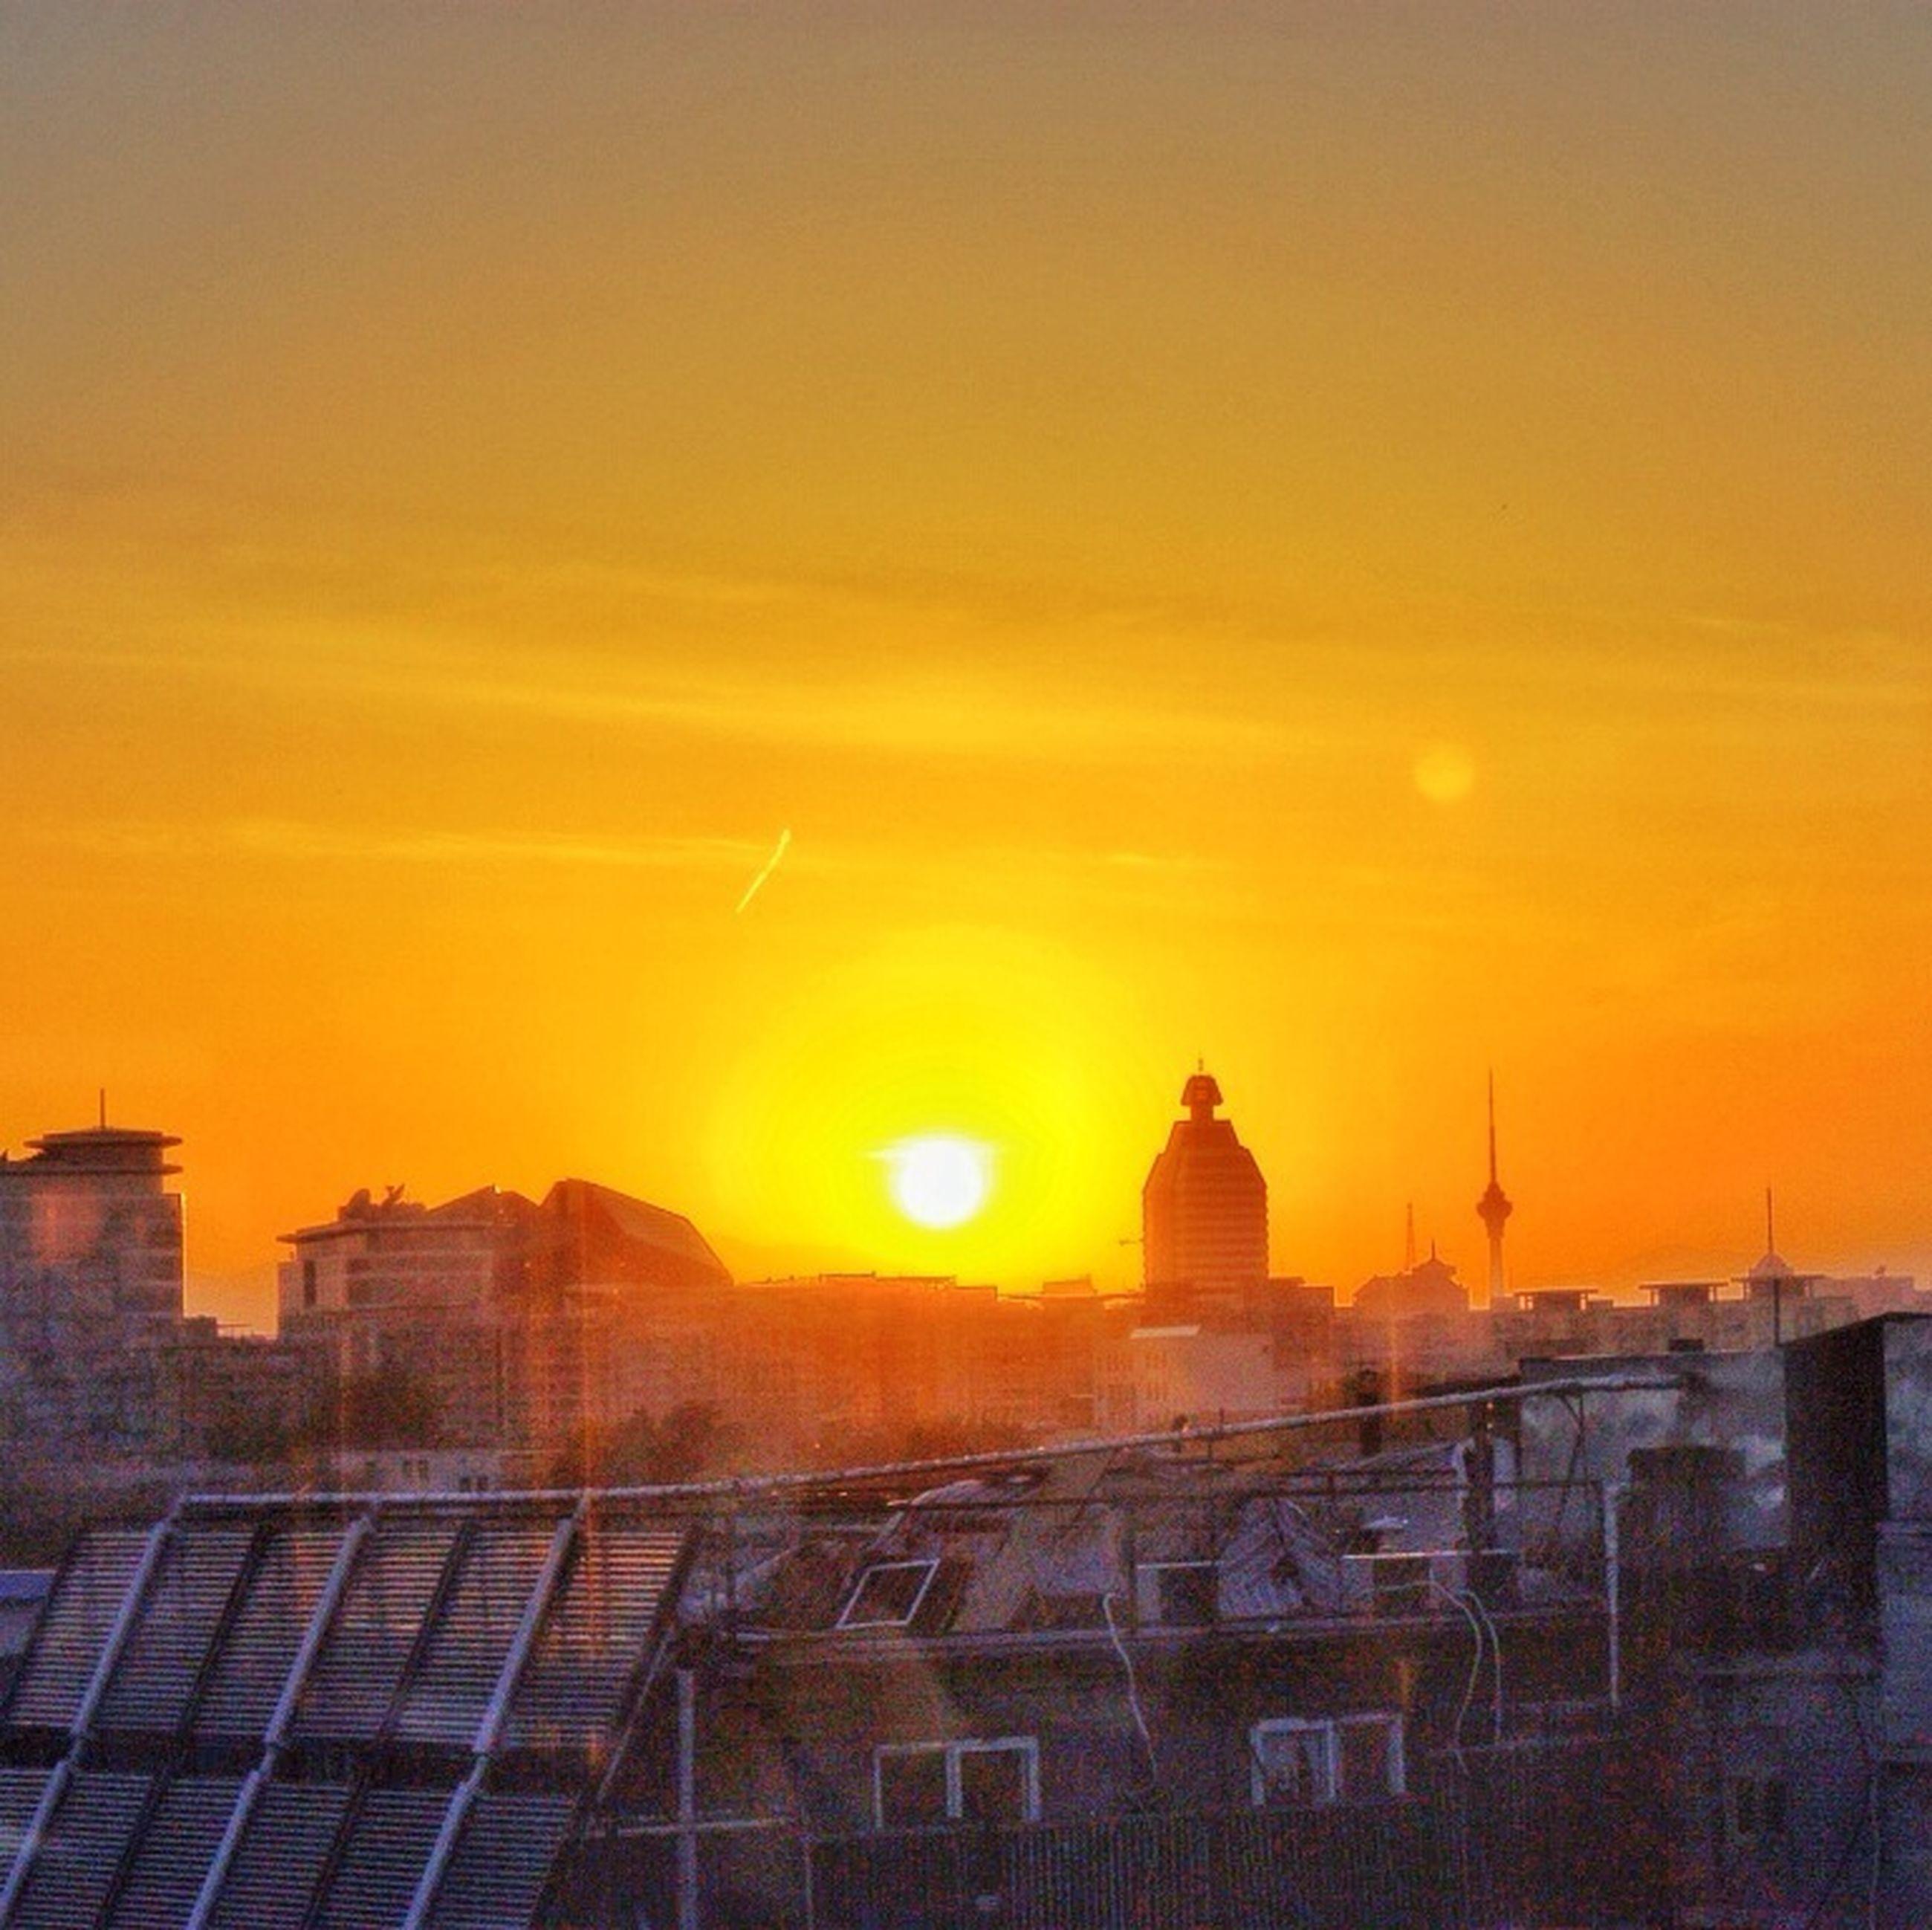 sunset, sun, orange color, building exterior, architecture, built structure, sky, silhouette, sunlight, sunbeam, scenics, cloud - sky, beauty in nature, nature, lens flare, city, outdoors, idyllic, building, no people